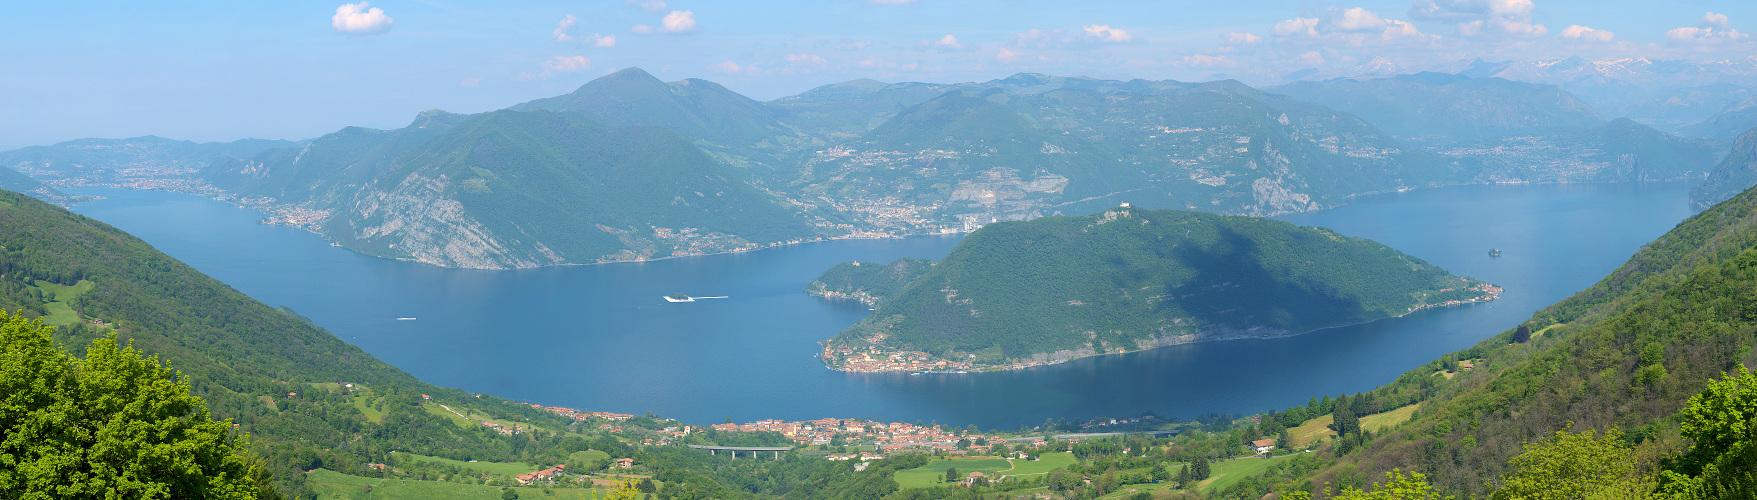 Panorama Photo - Panorama: Lago d'Iseo